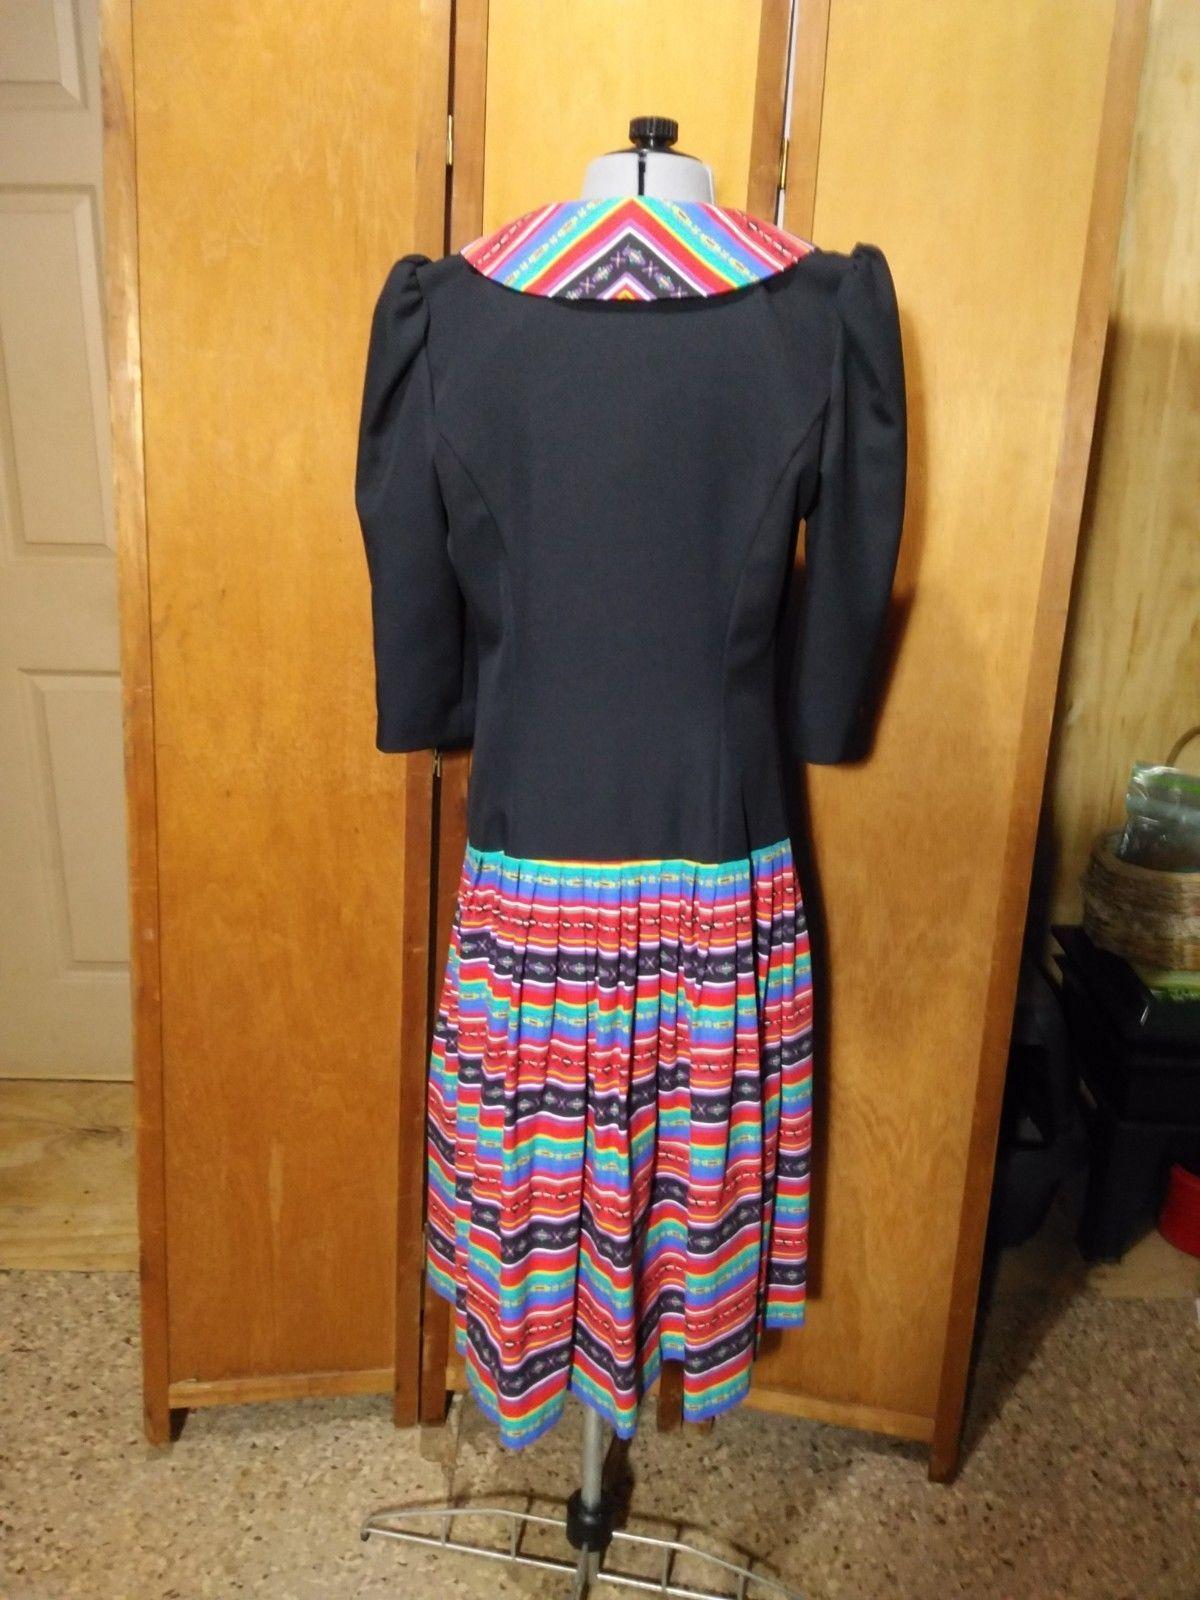 Vintage Eileen Scott Dallas Dress Size 8 Multi-Colored